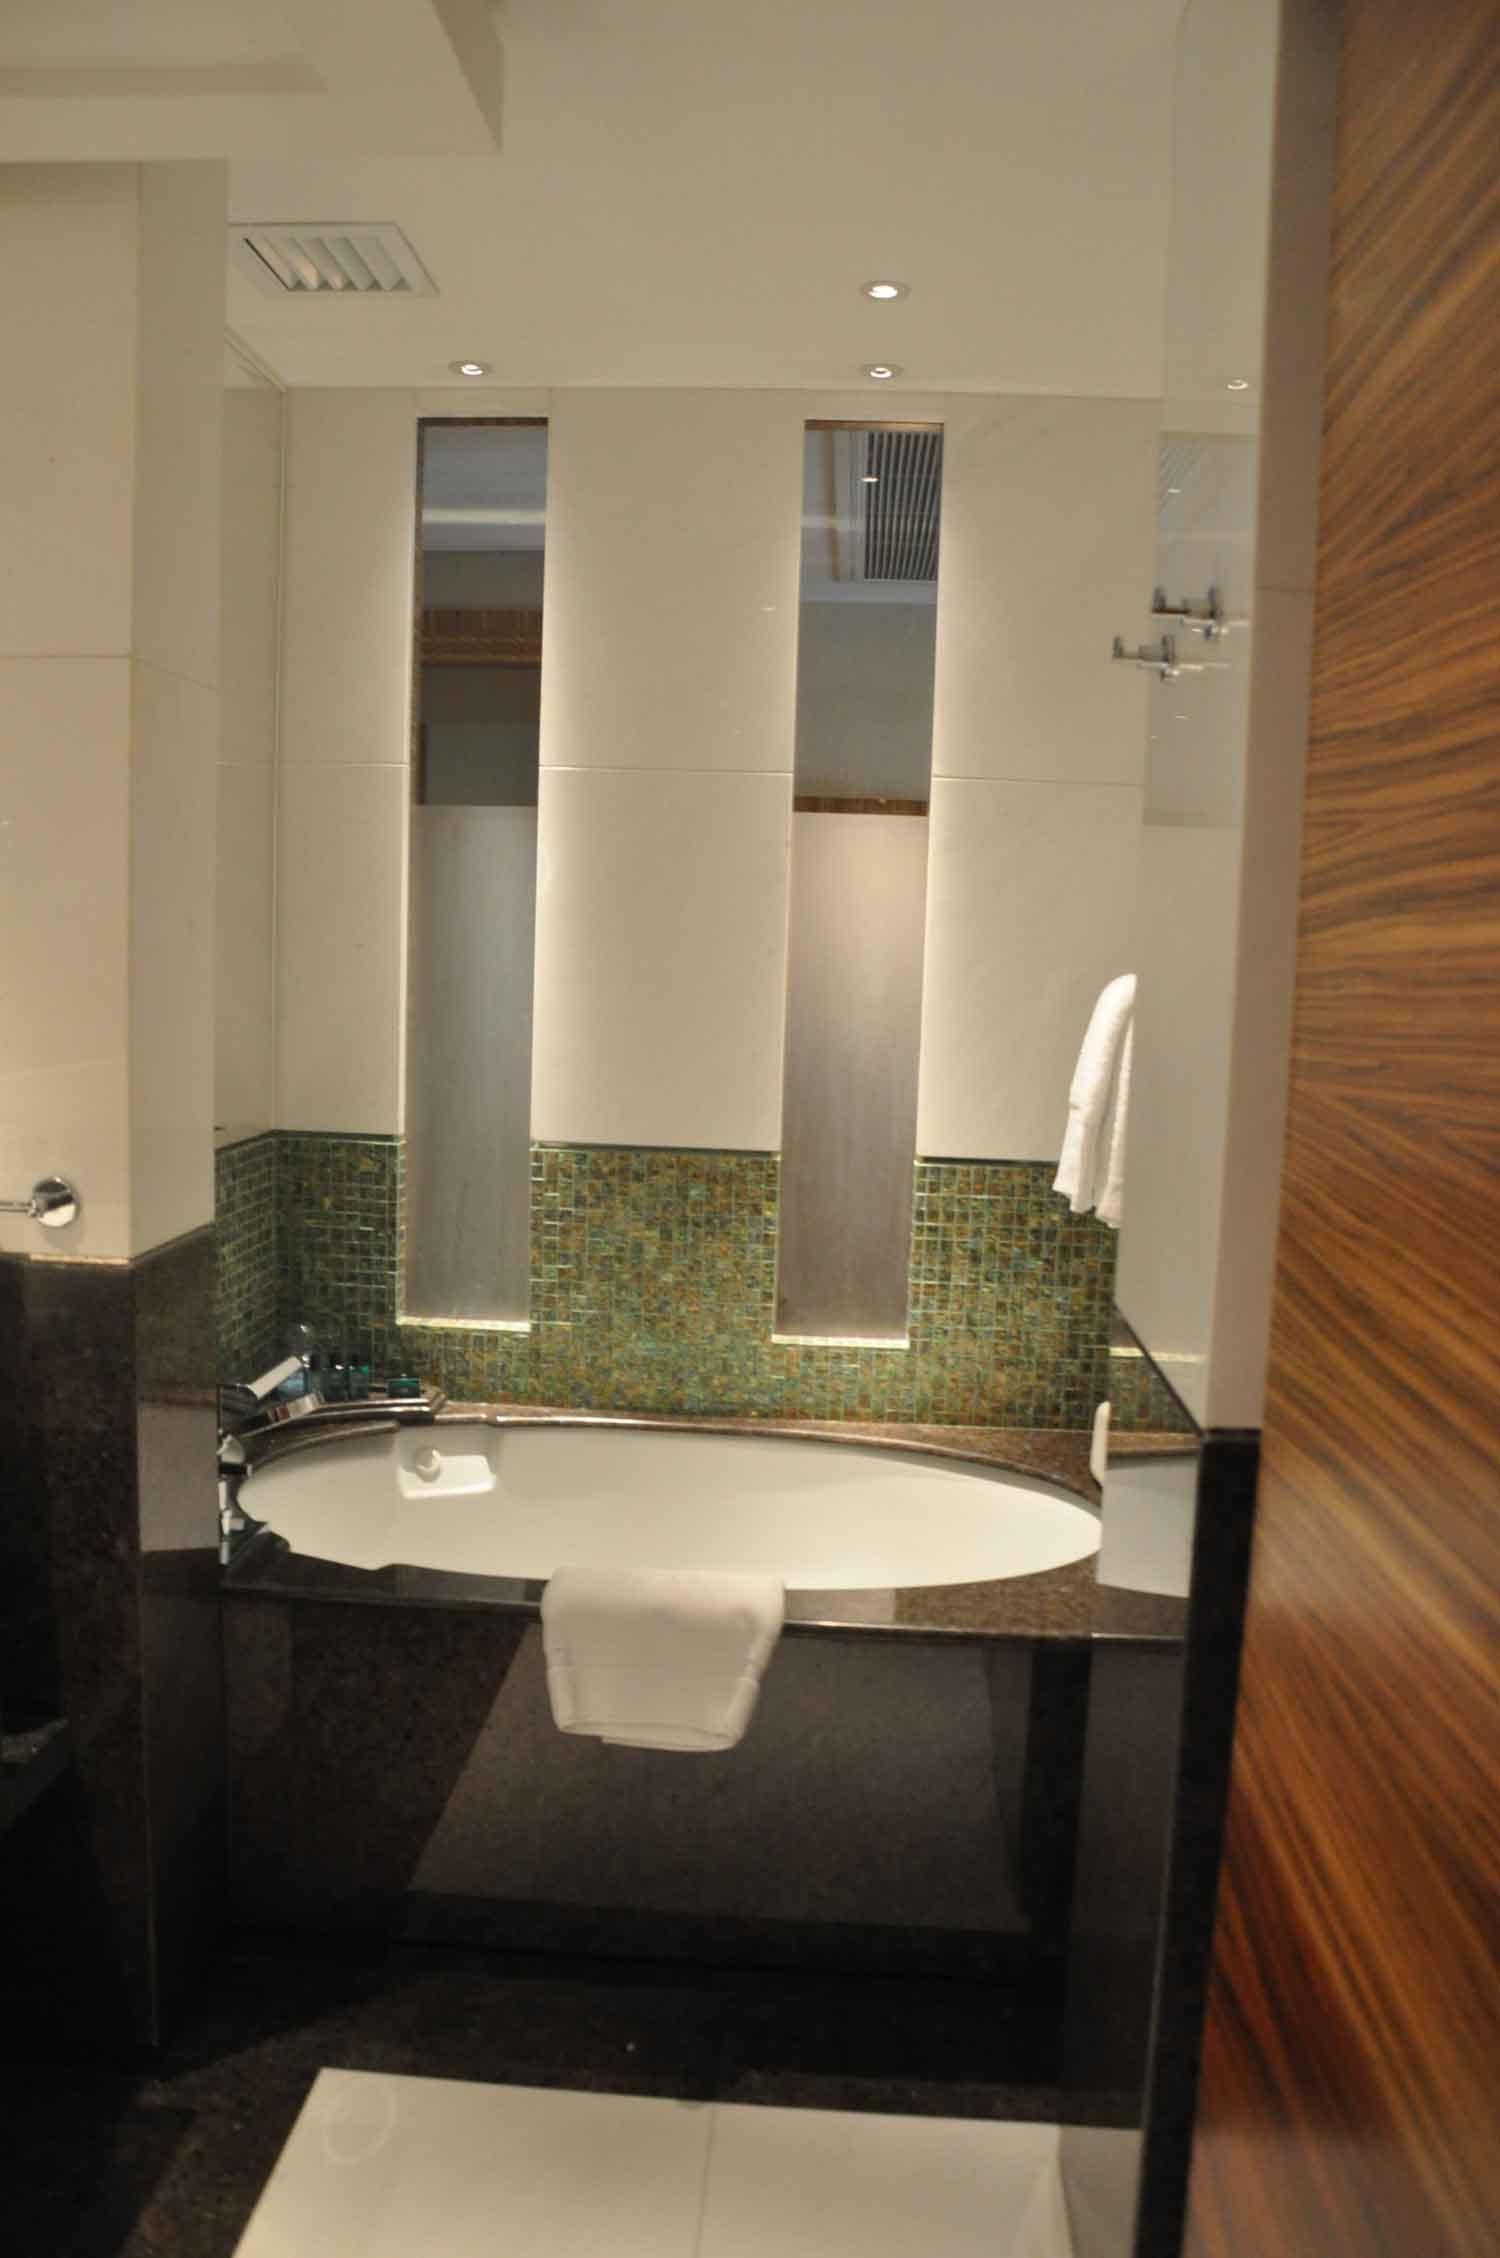 Pousada de Sao Tiago Macau Barra Suite bathtub